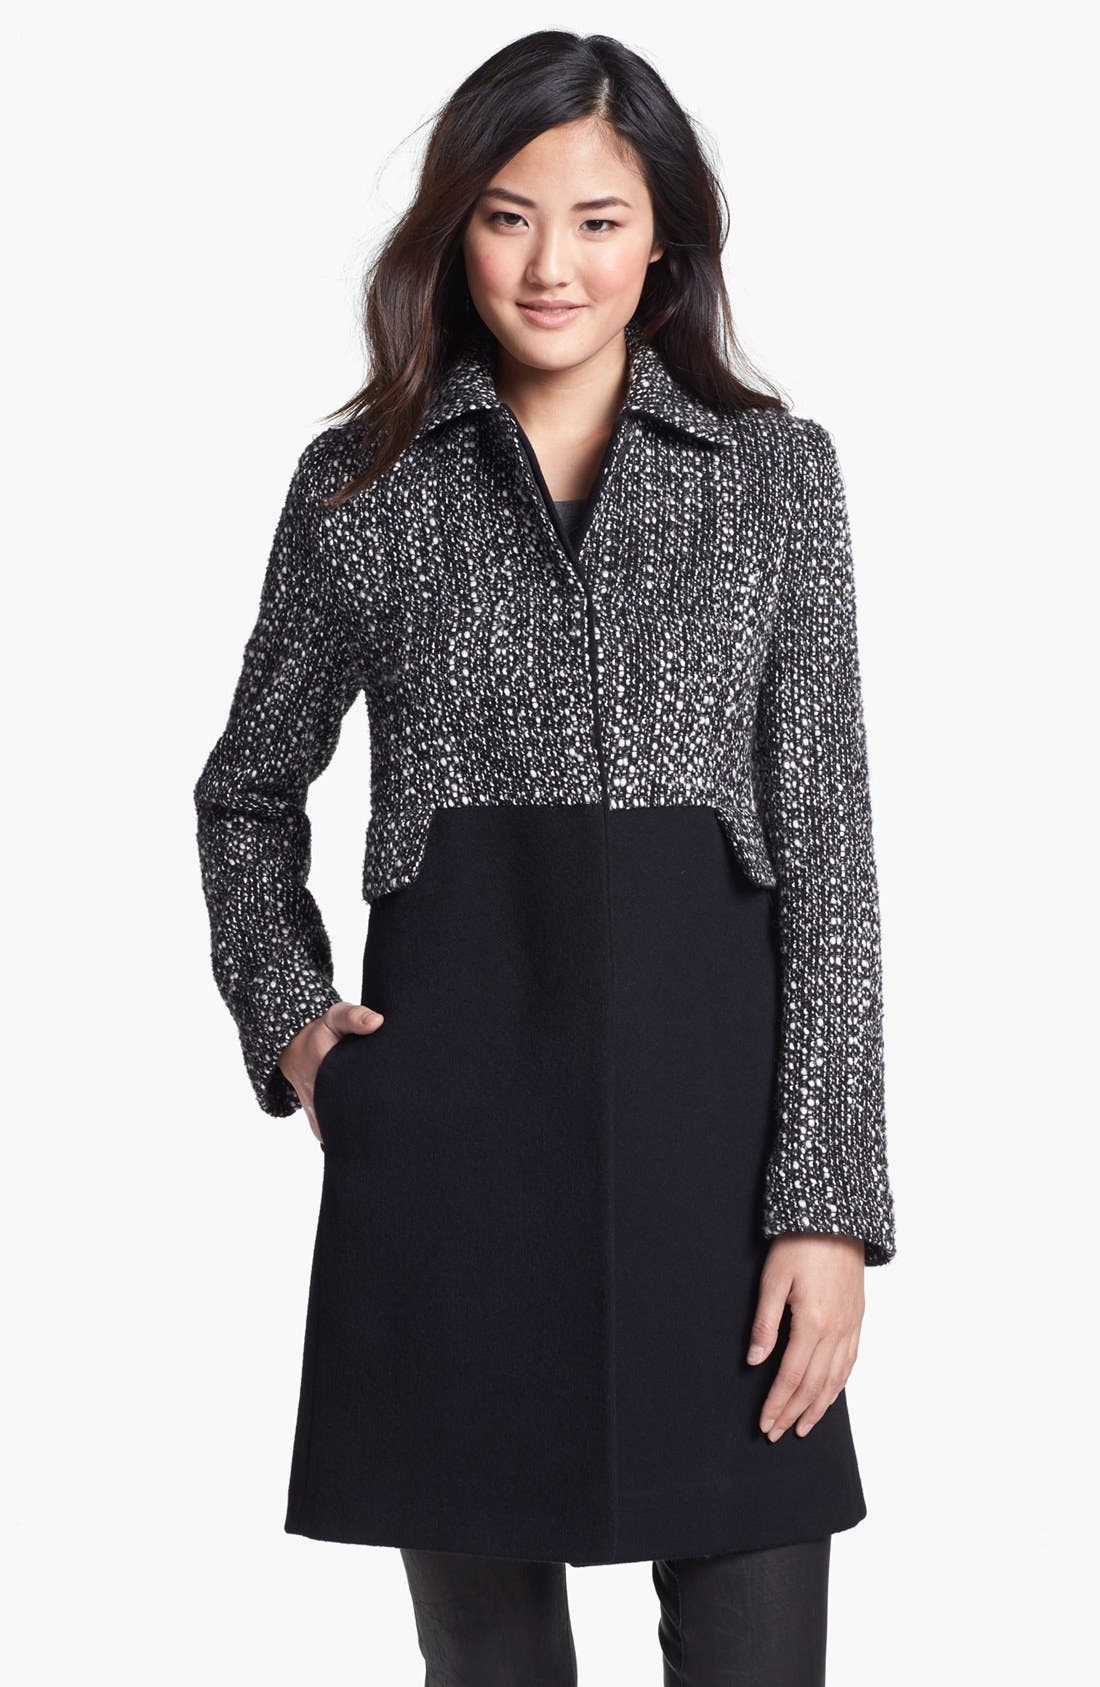 Alternate Image 1 Selected - Fleurette Thistle Tweed & Loro Piana Wool City Coat (Petite)